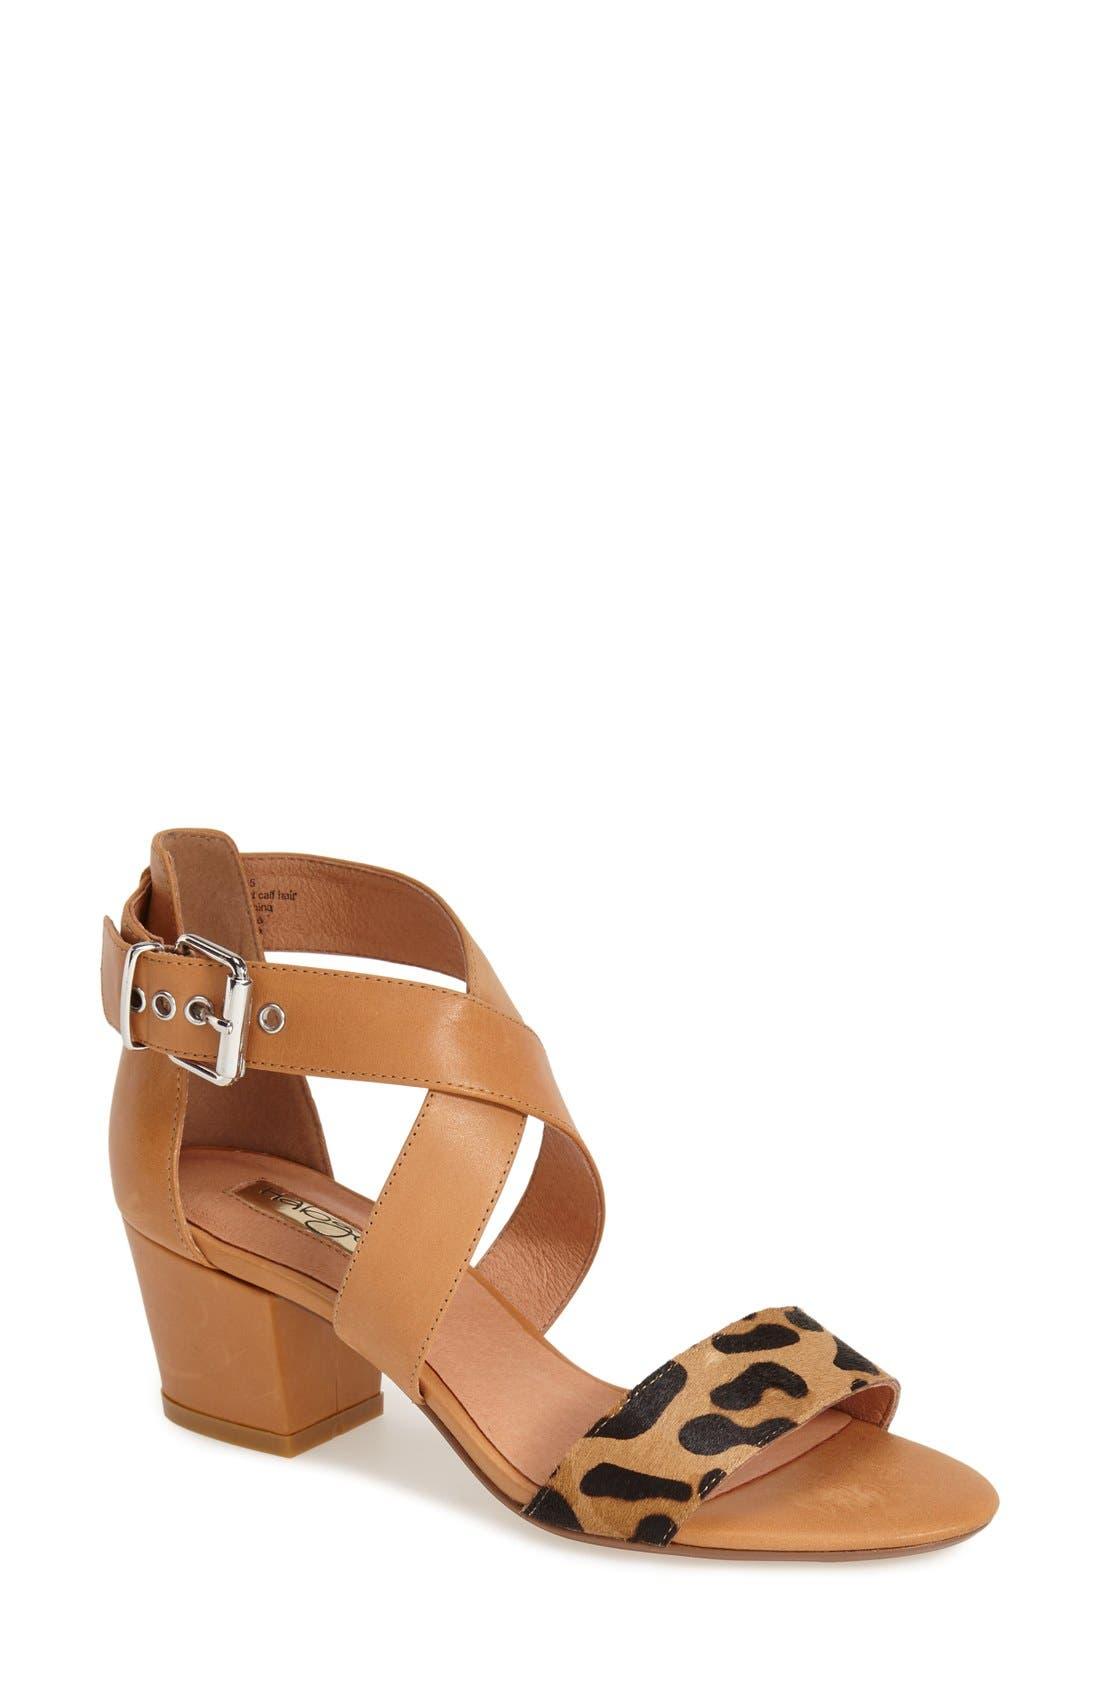 Main Image - Halogen 'Rena' Crisscross Strap Sandal (Women)